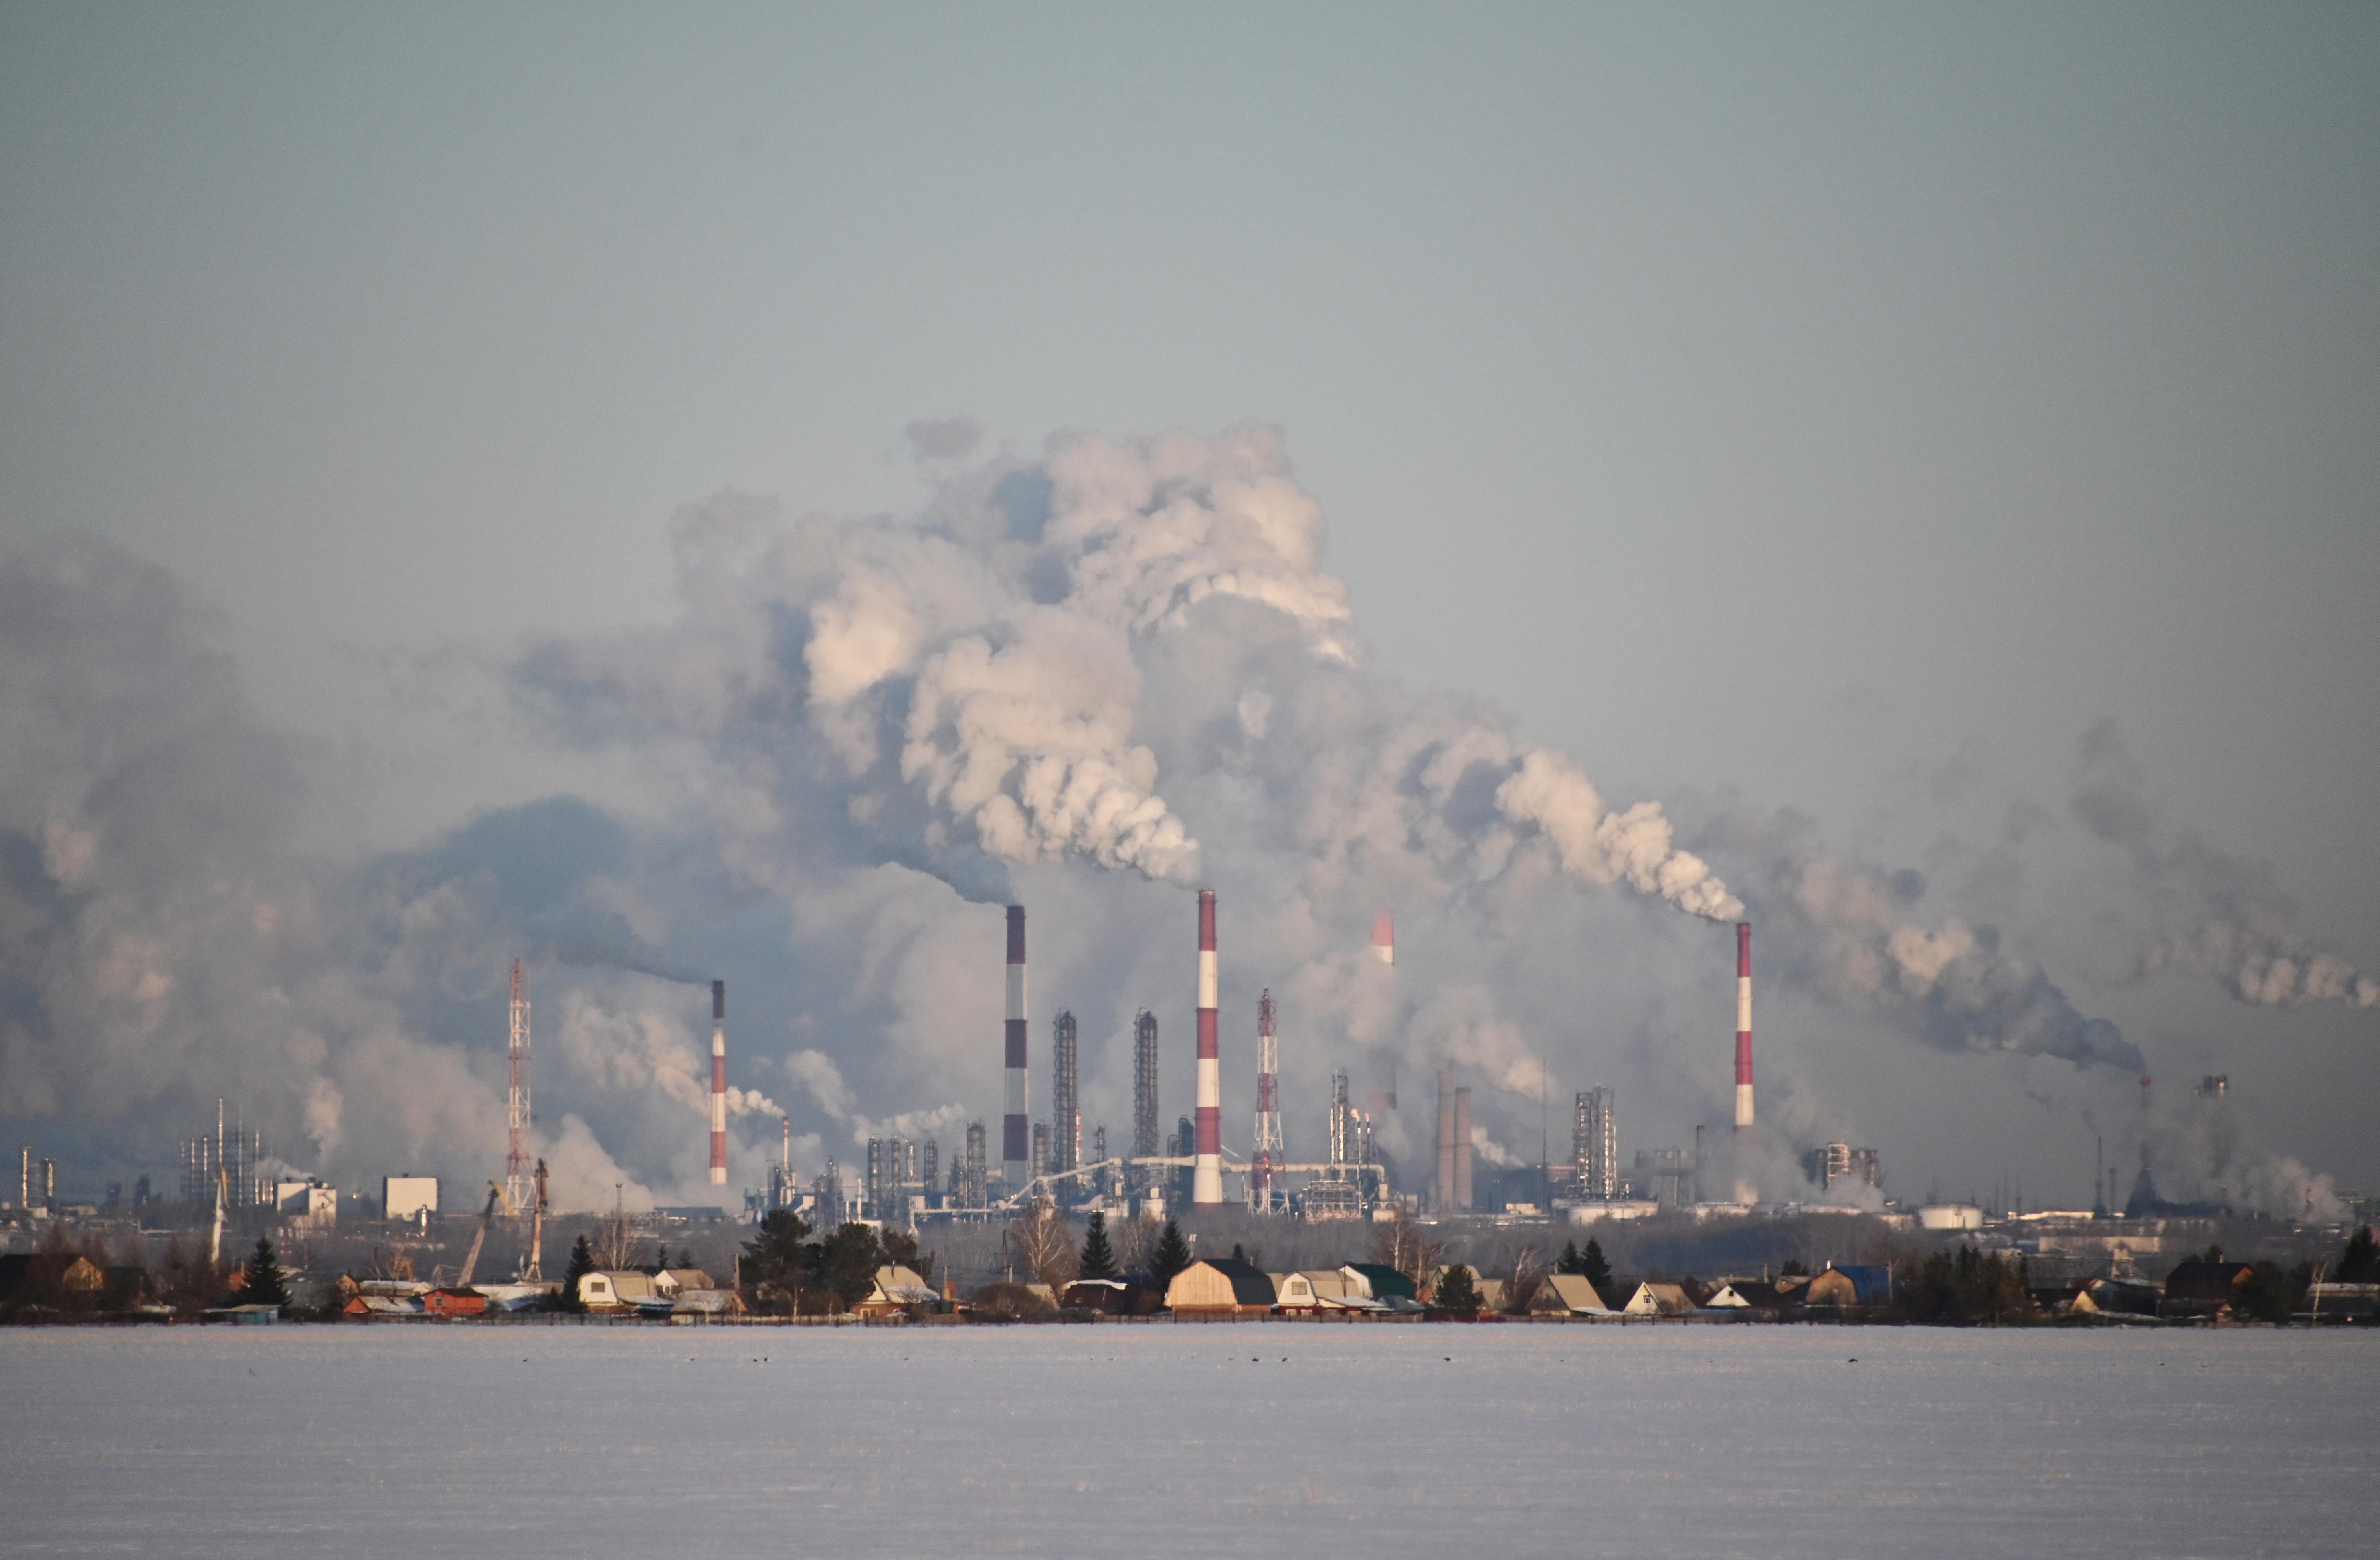 A view shows the Gazprom Neft's oil refinery in Omsk, Russia February 10, 2020. REUTERS/Alexey Malgavko